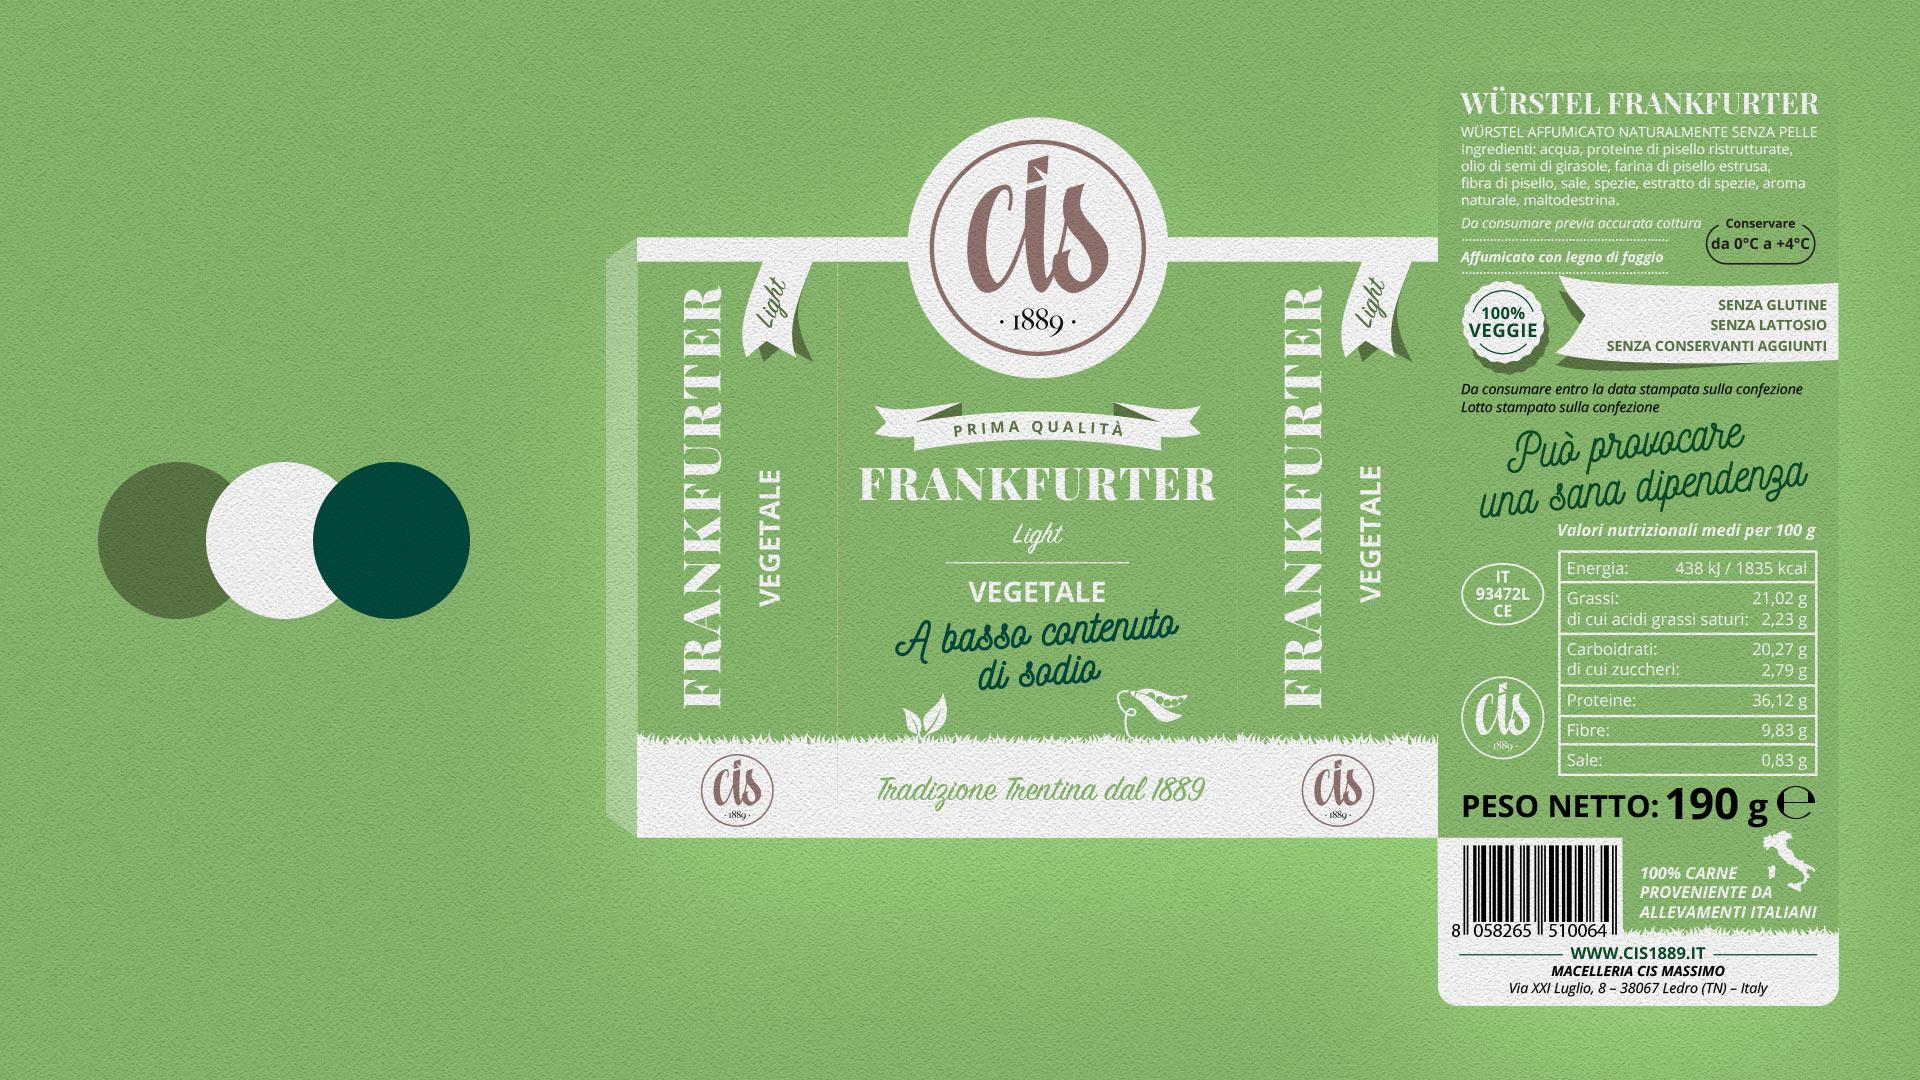 frankfurter CIS packaging grafico milano